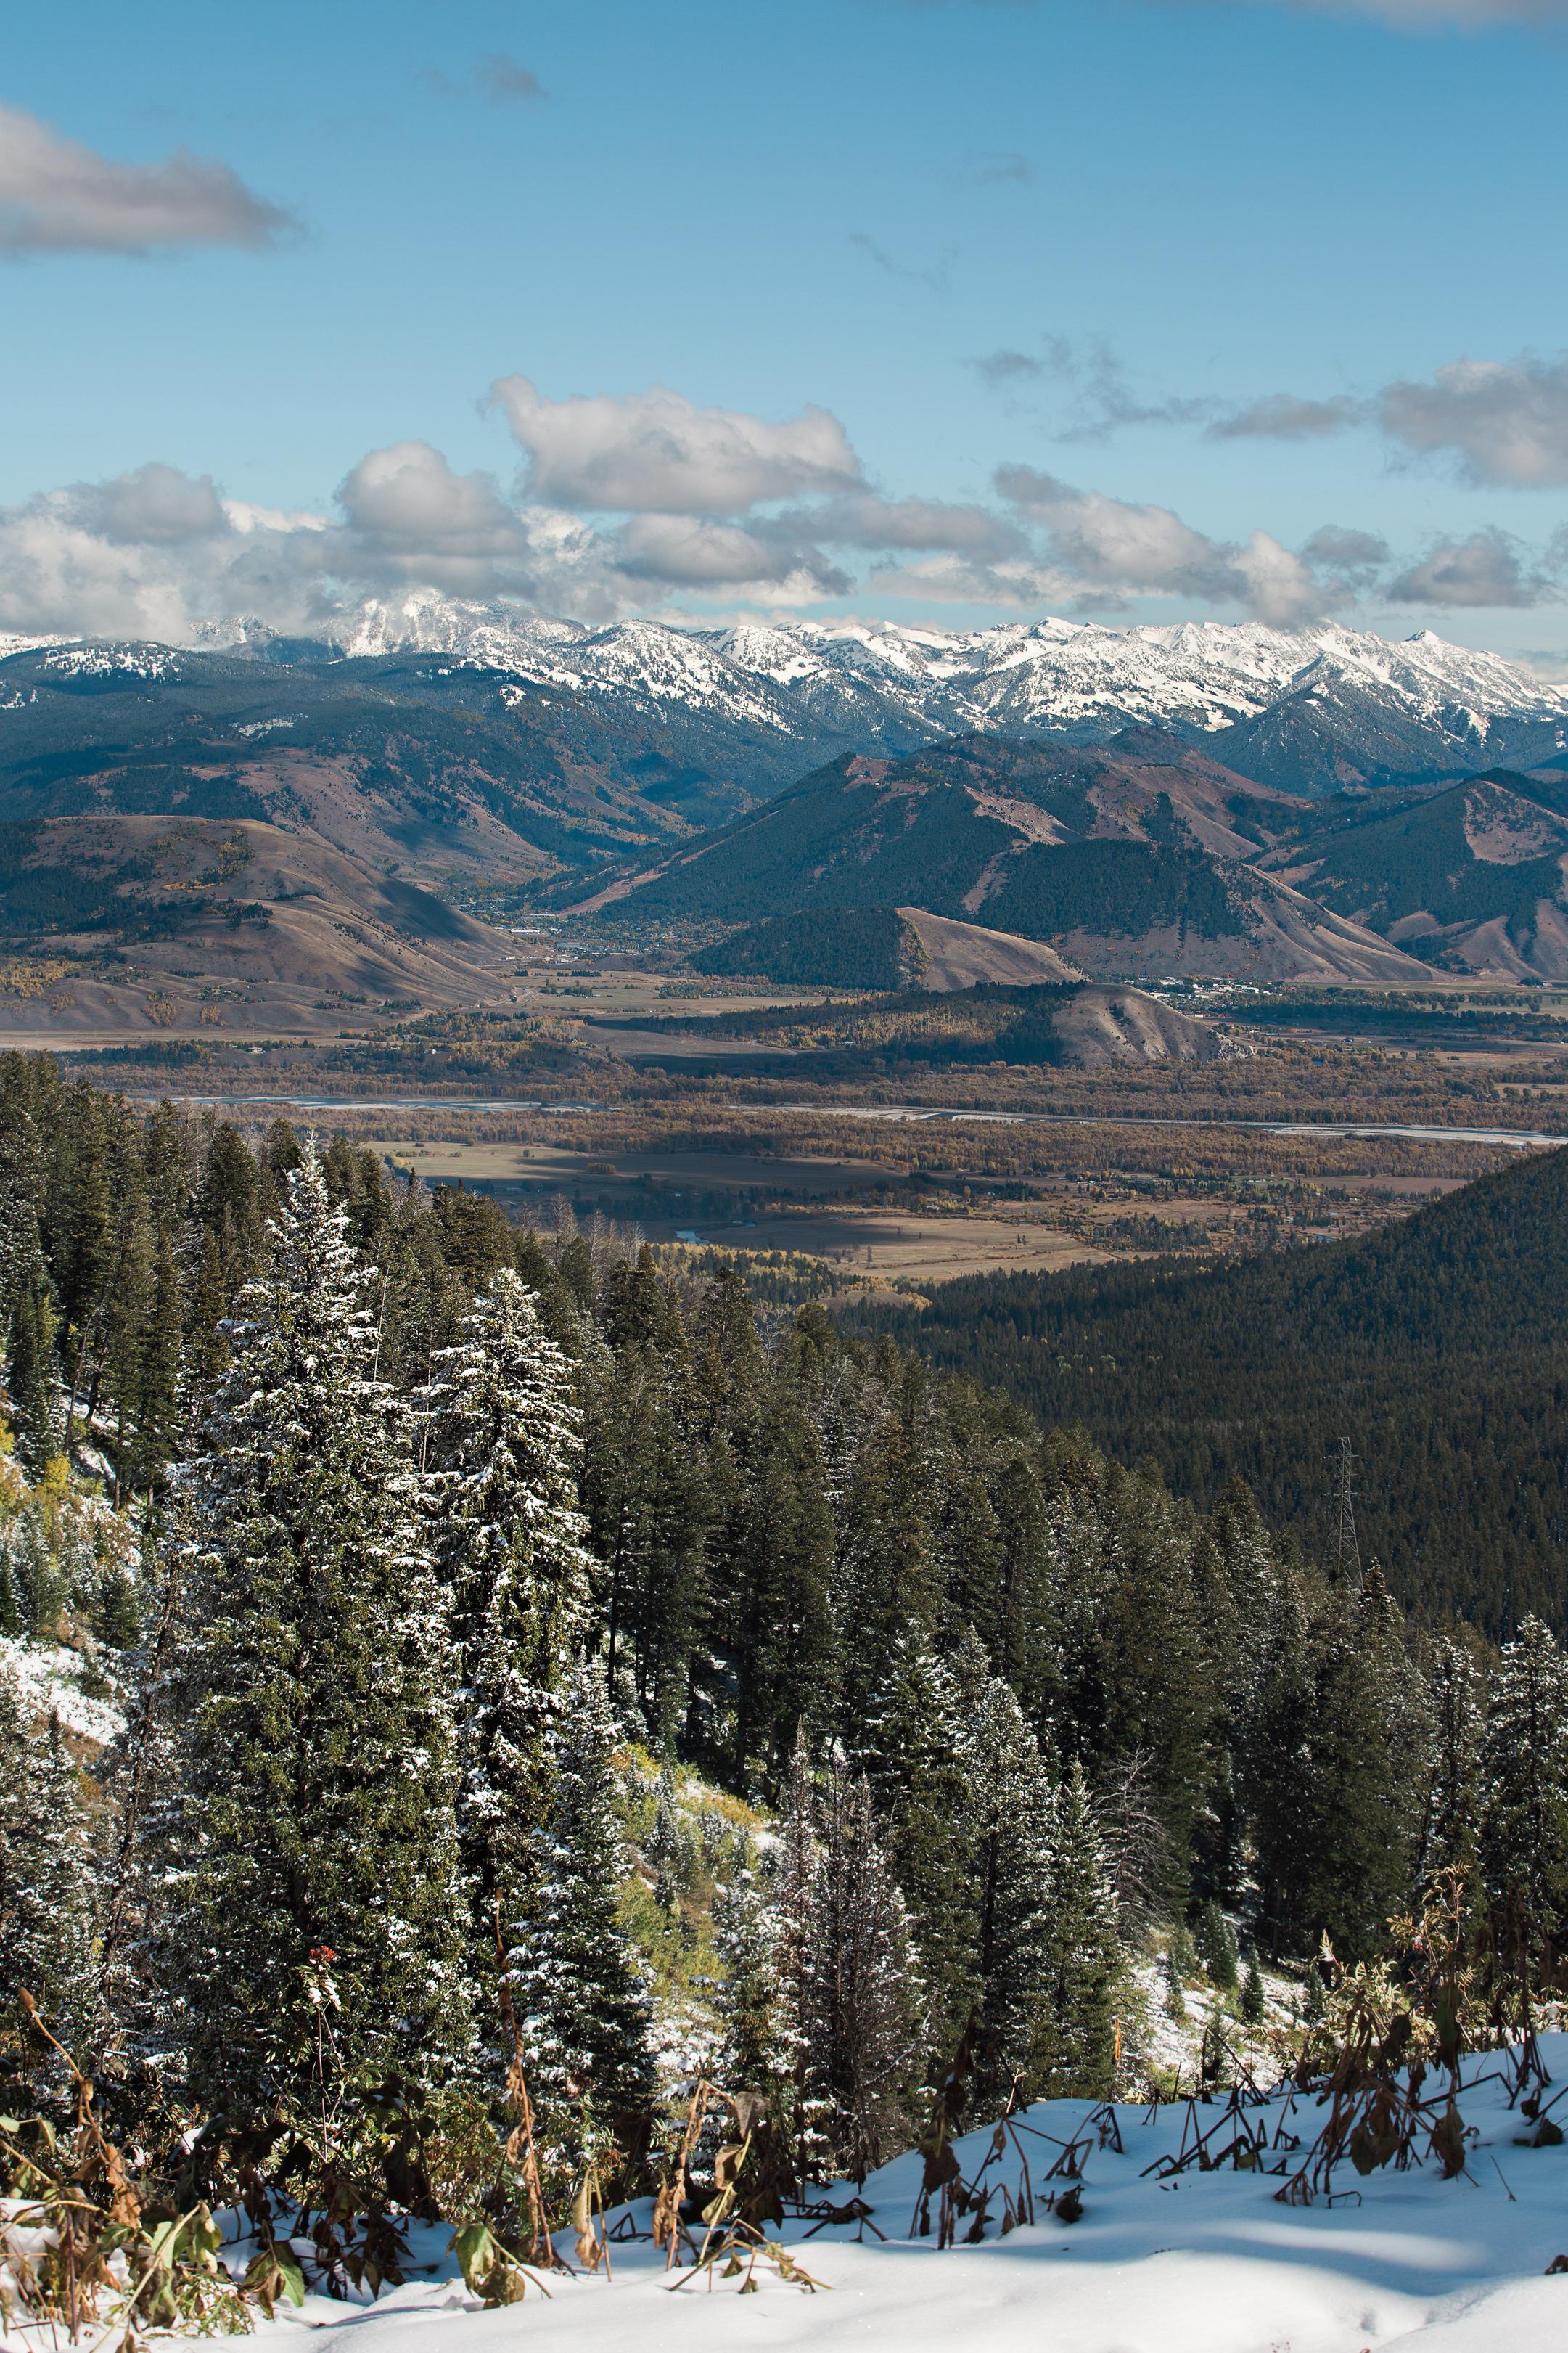 Cindy_Giovagnoli_Idaho_Wyoming_Grand_Teton_National_Park_autumn_aspens_camping_mountains-016.jpg